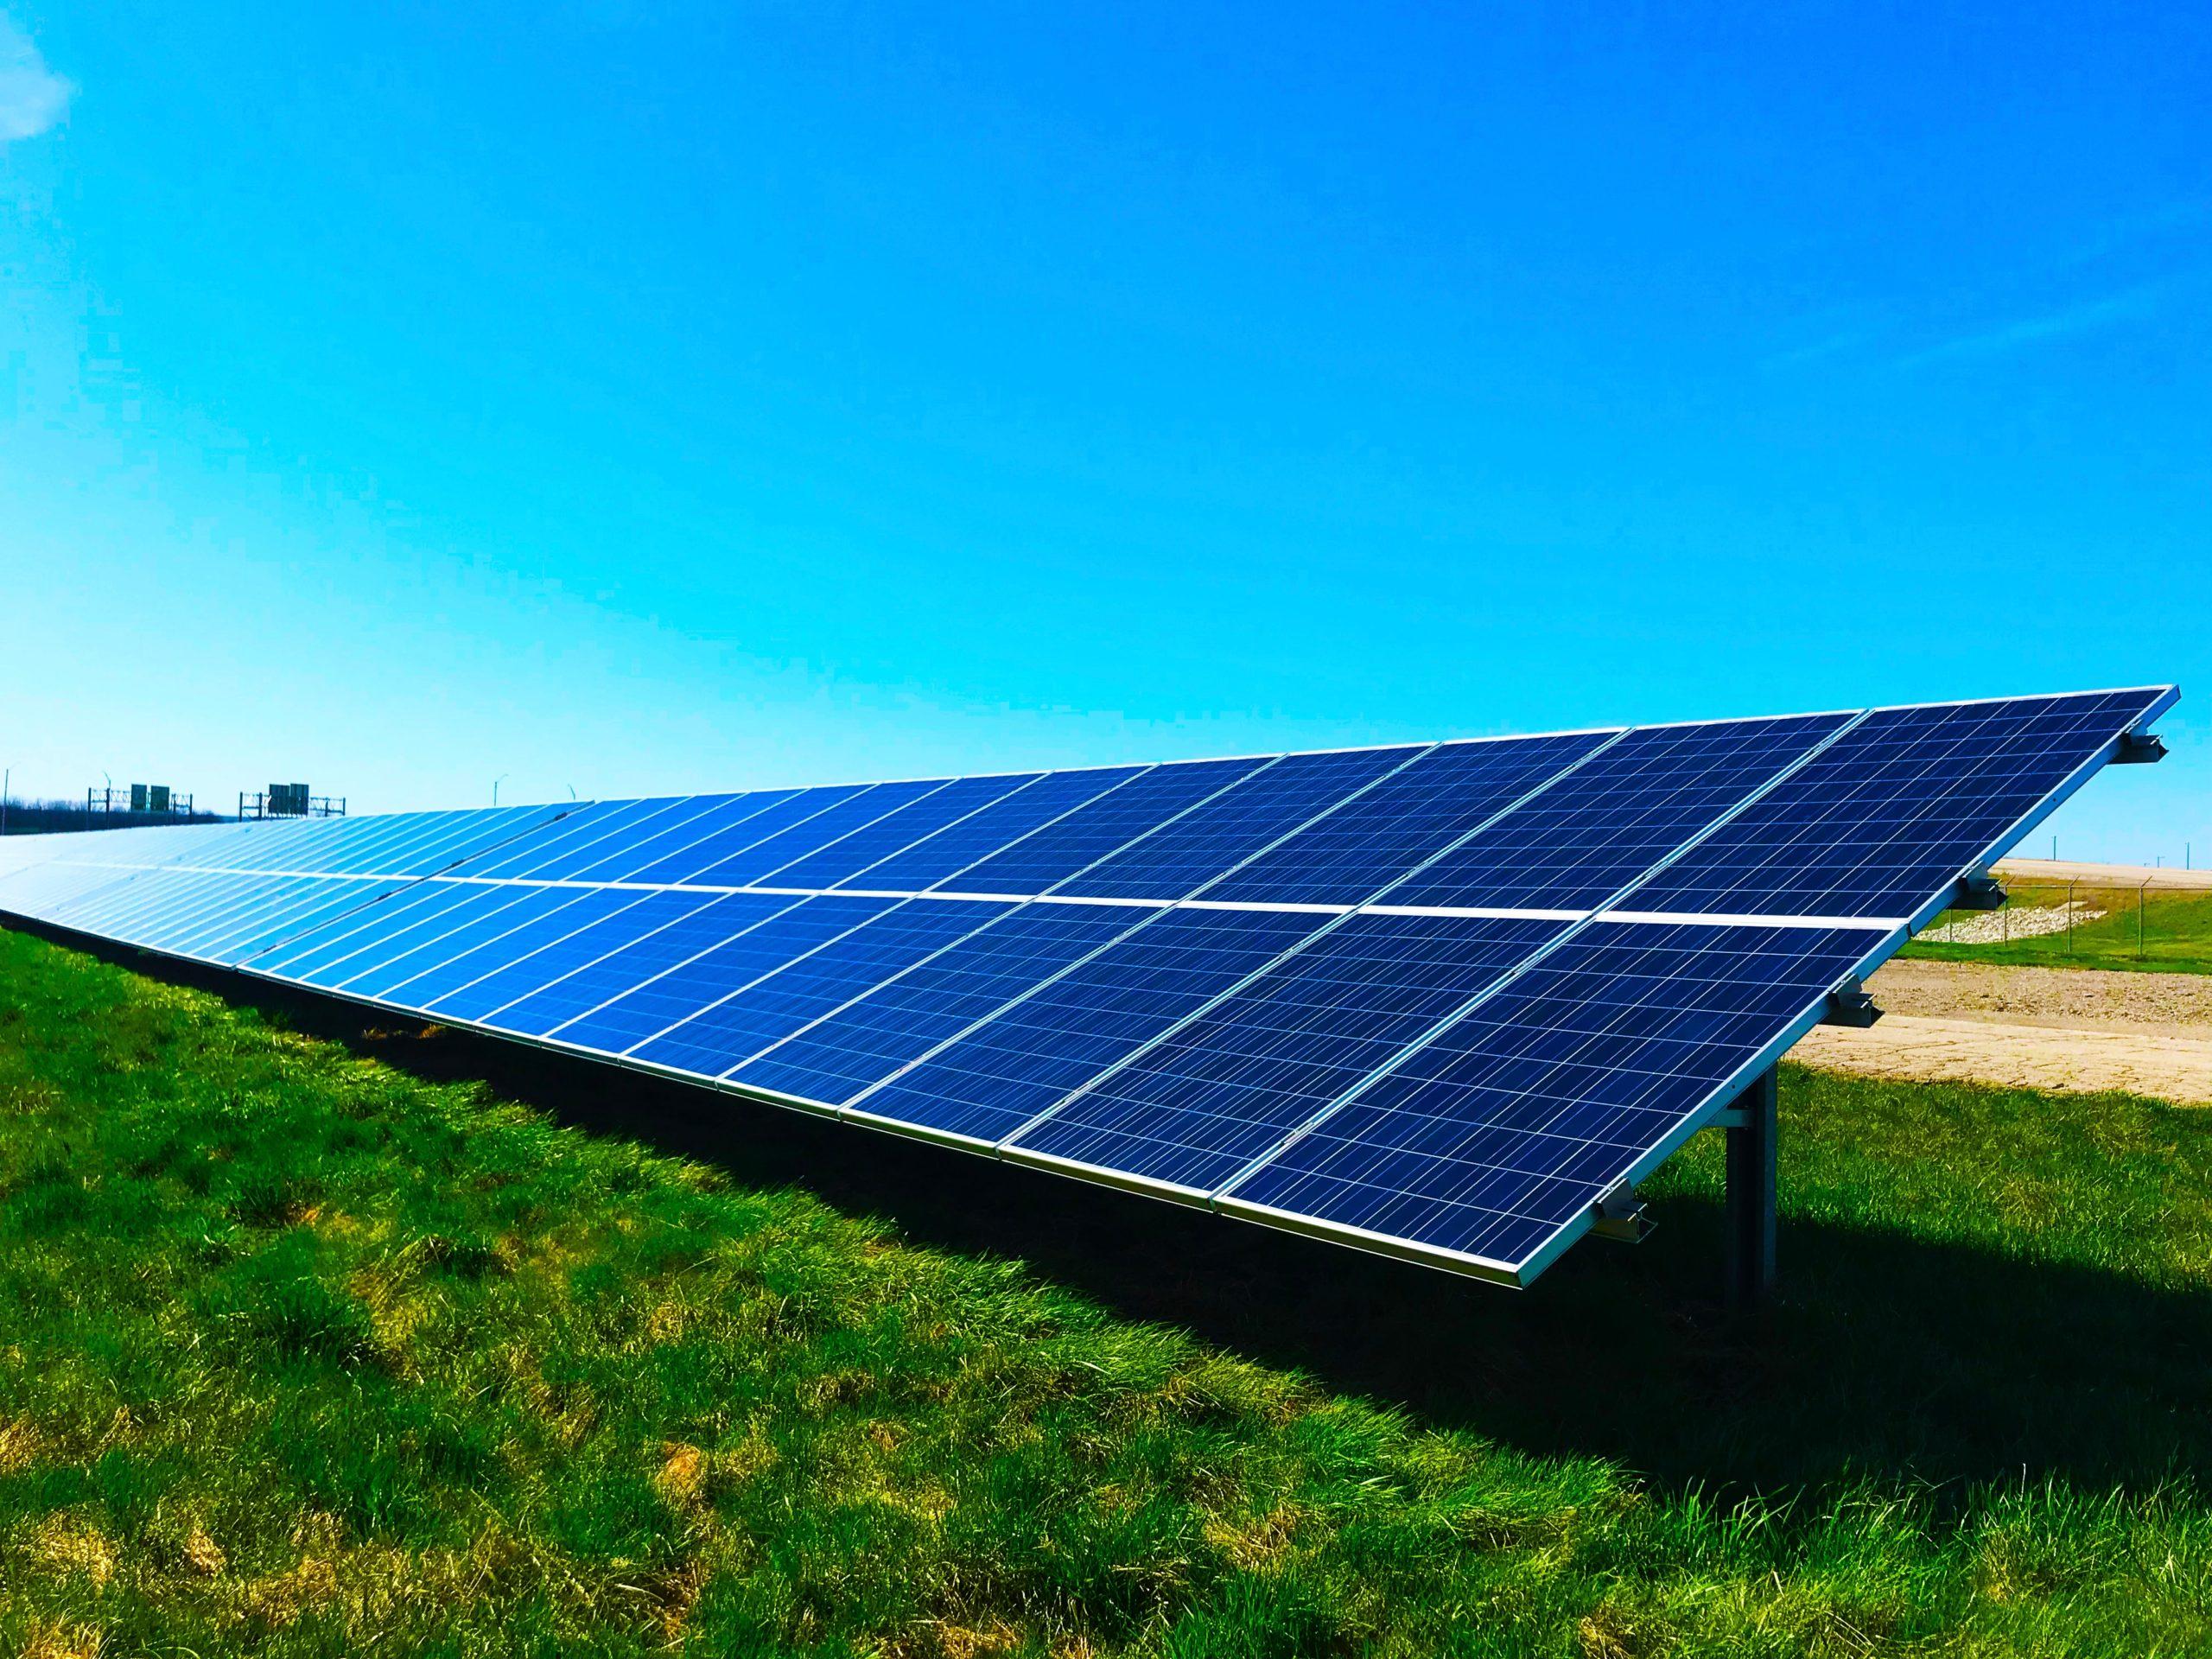 Usina solar - módulo fotovoltaico - AXS Energia